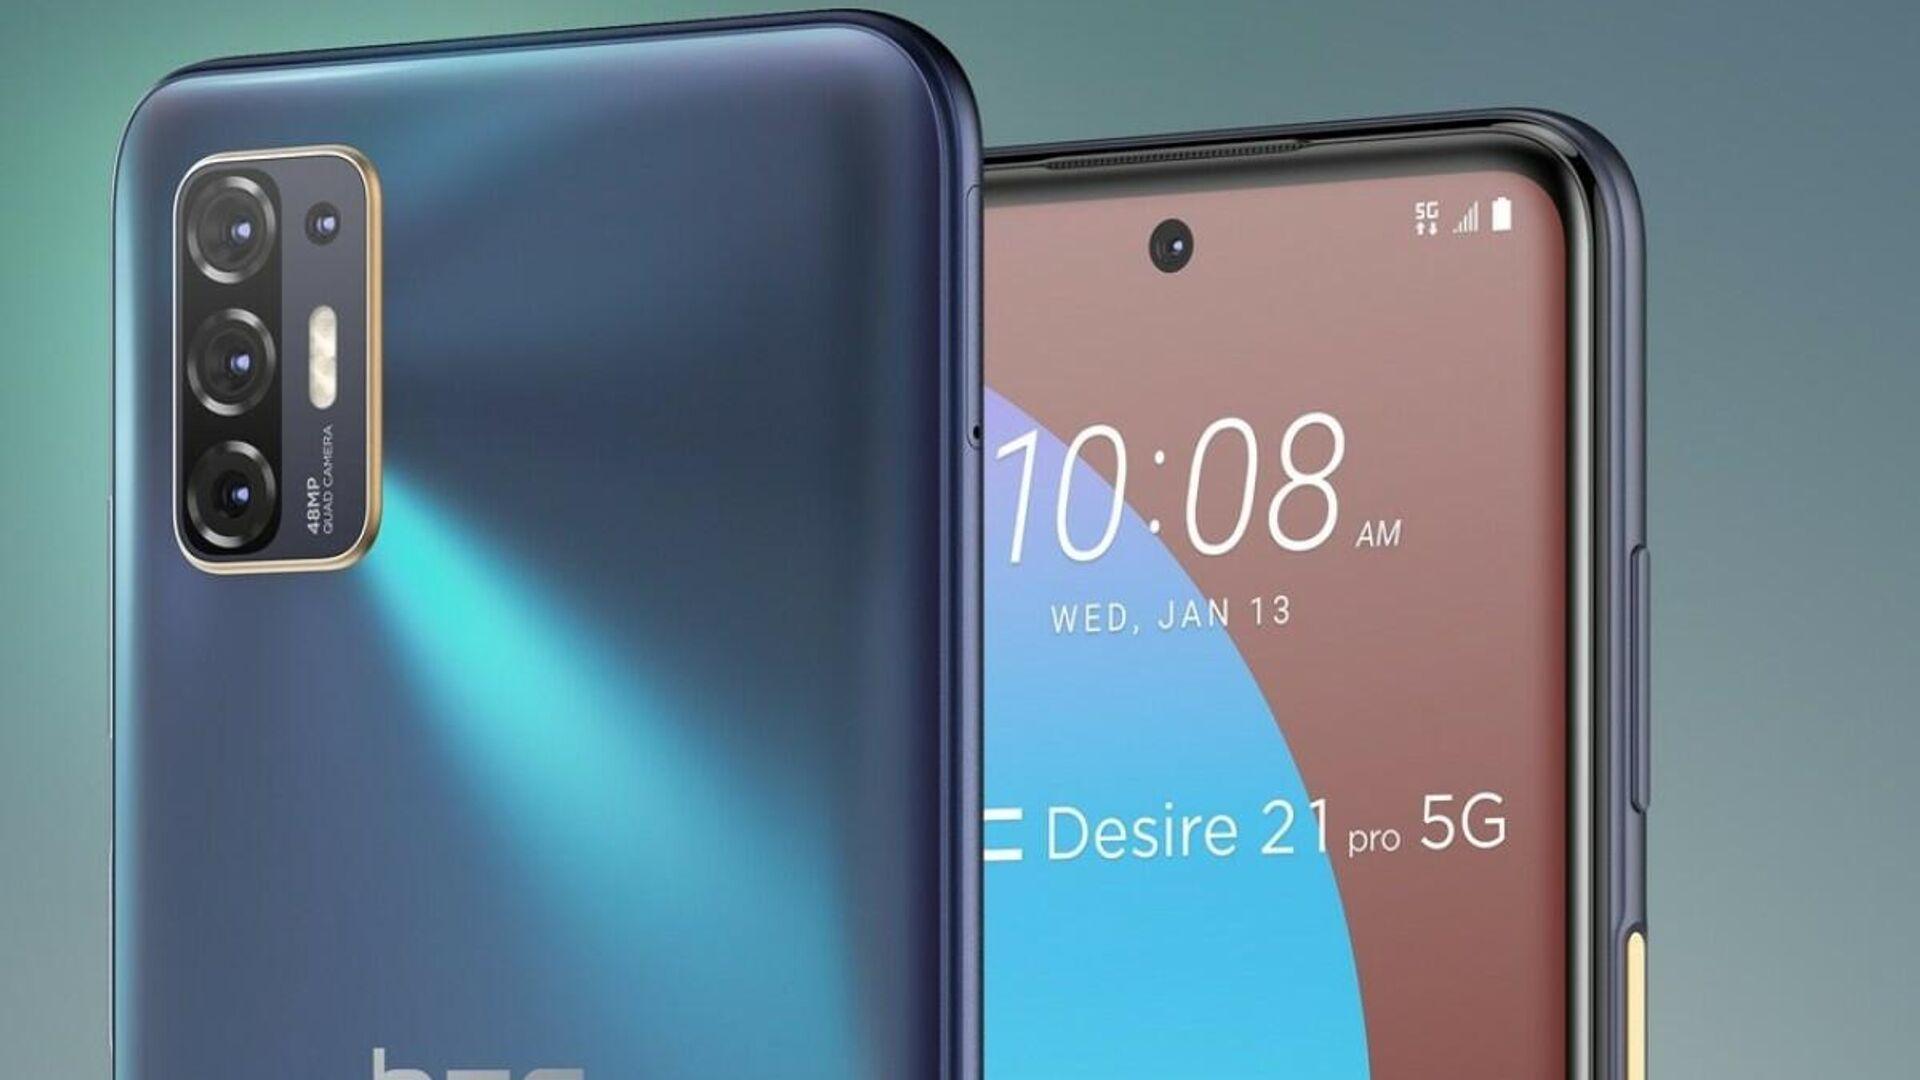 HTC Desire 21 Pro 5G - РИА Новости, 1920, 13.01.2021